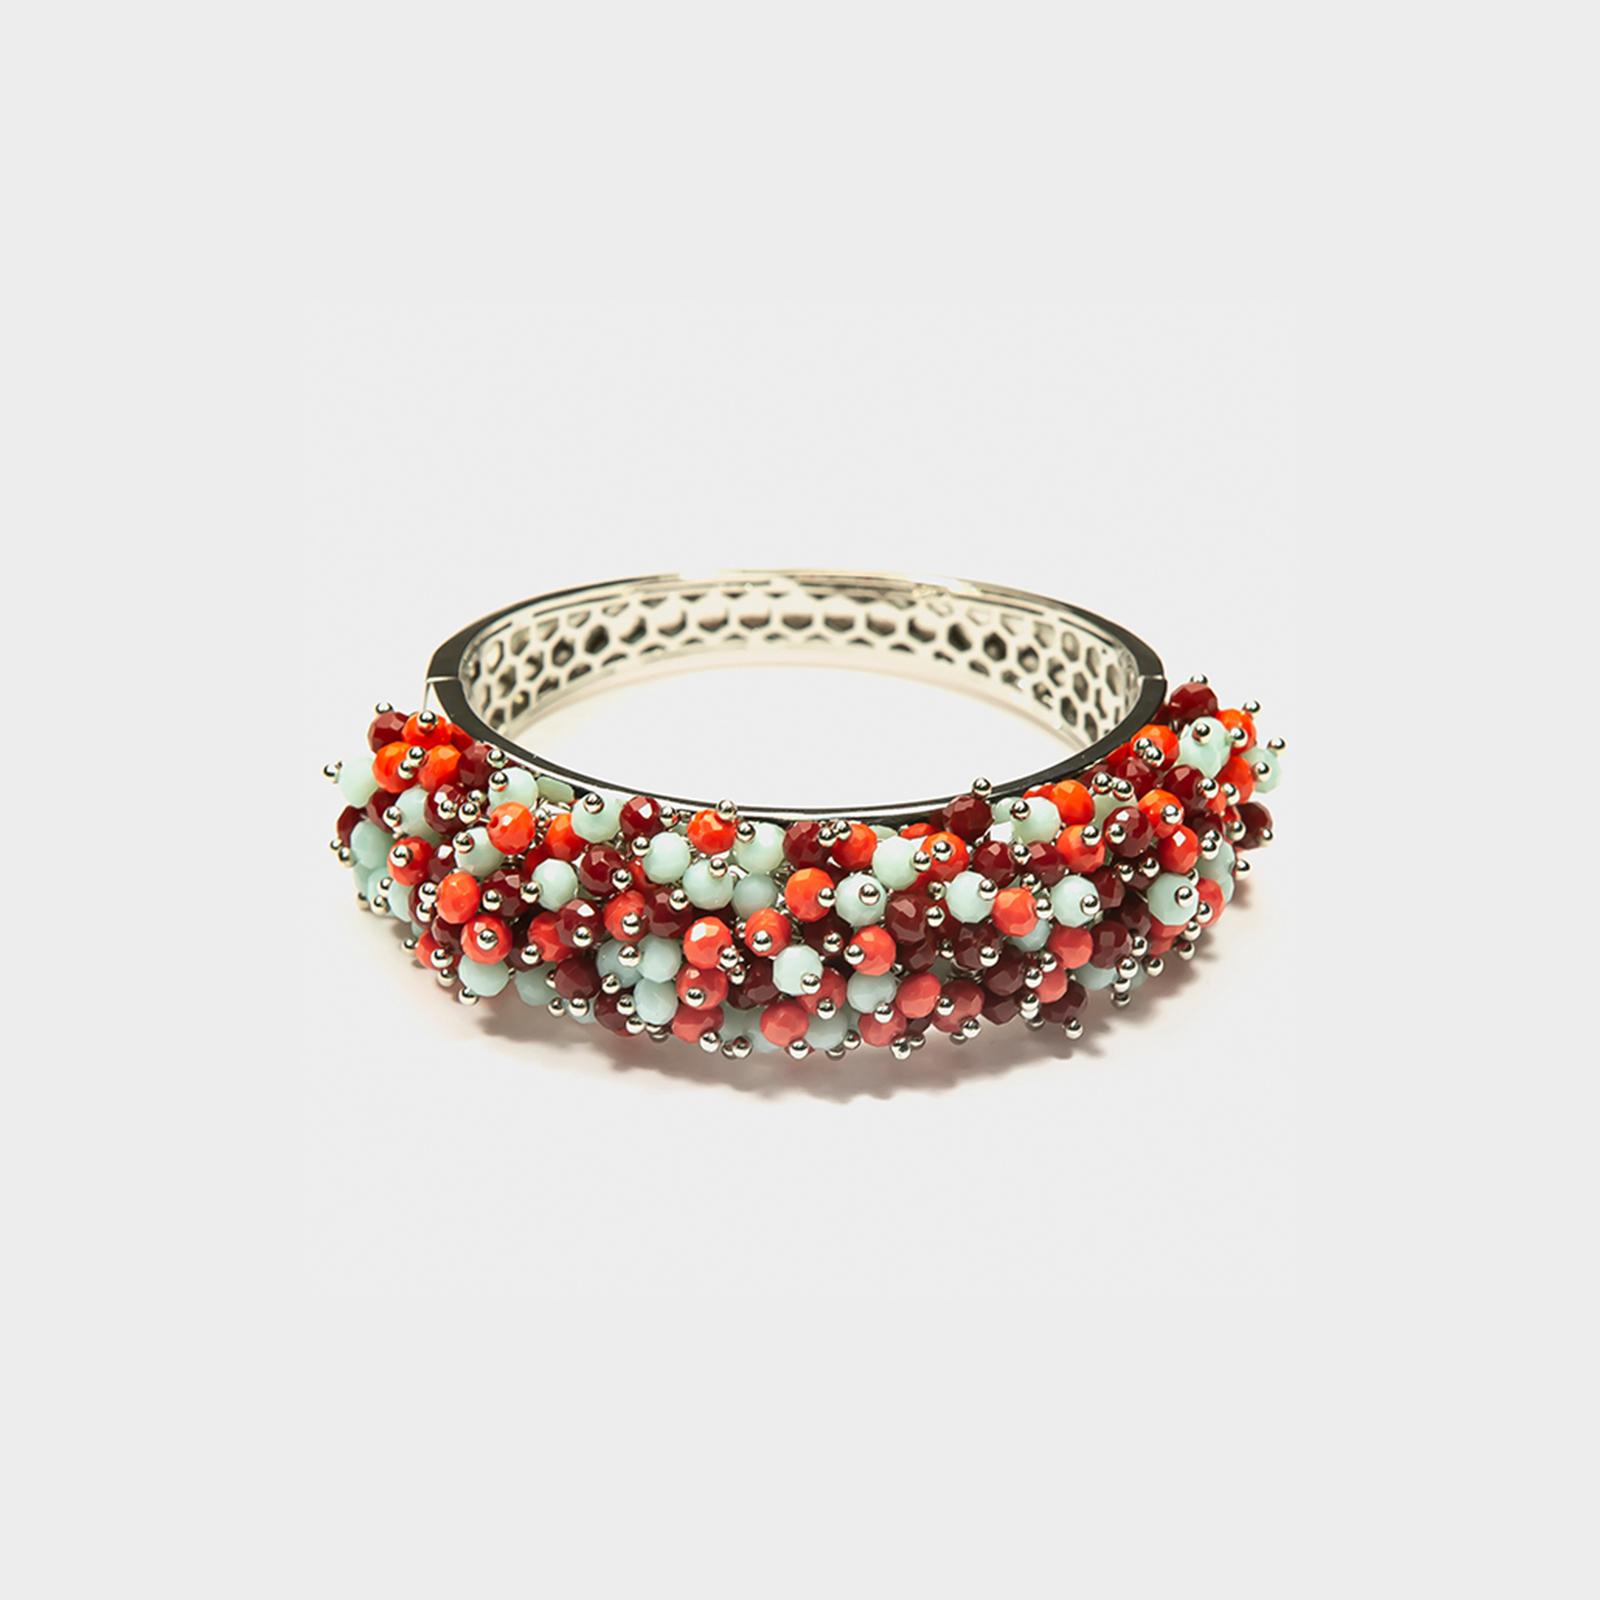 Precious Bracelet Red/Turquoise L